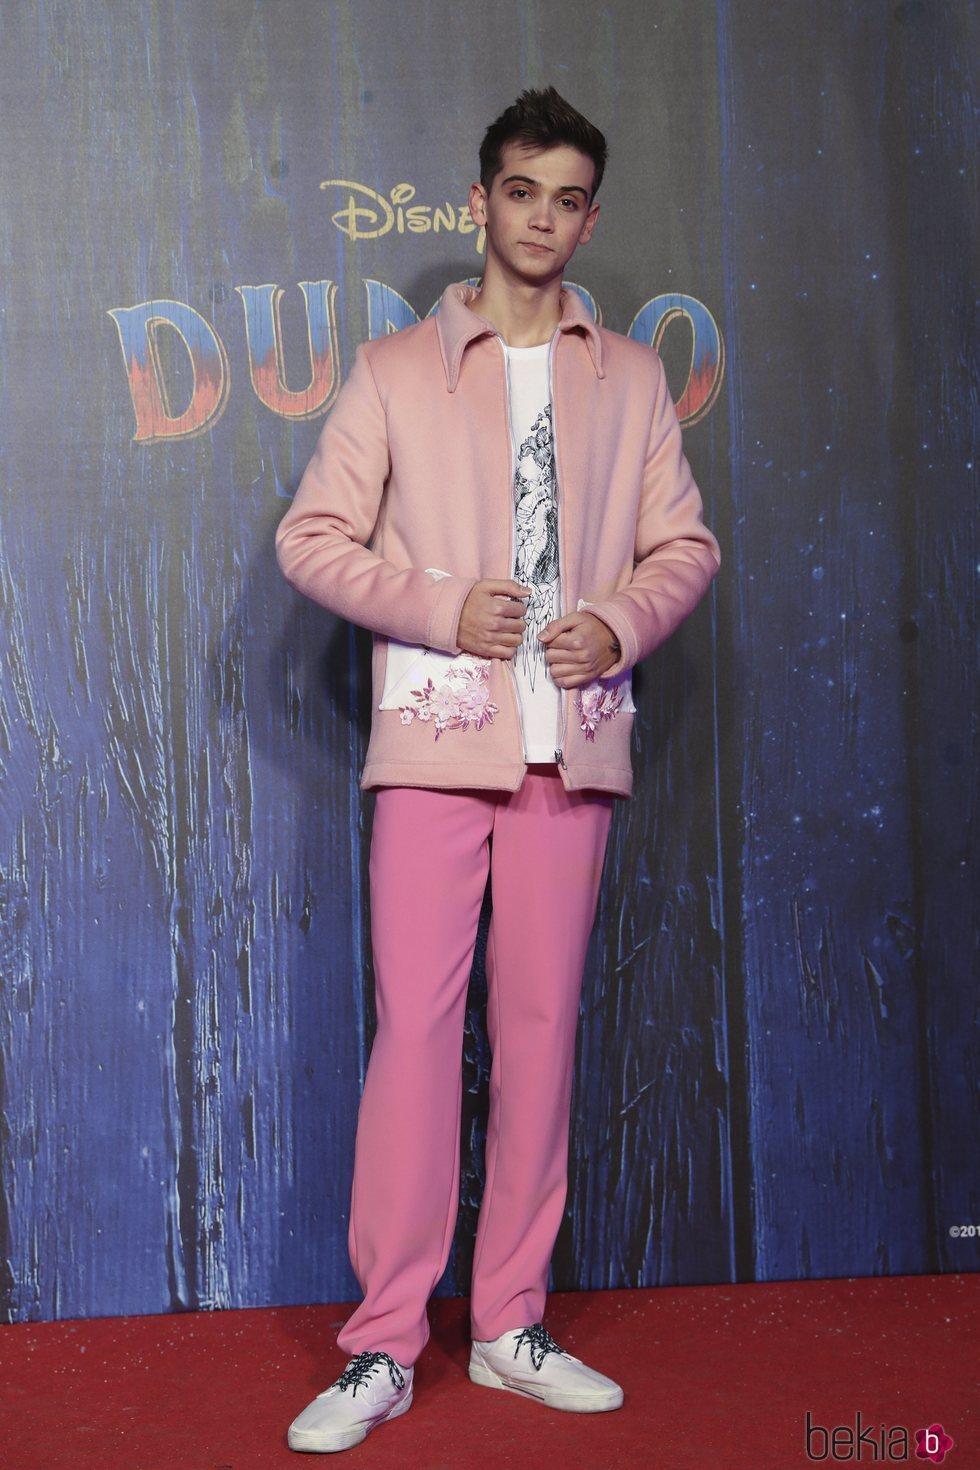 Dave Zulueta posando en la premiere de 'Dumbo'